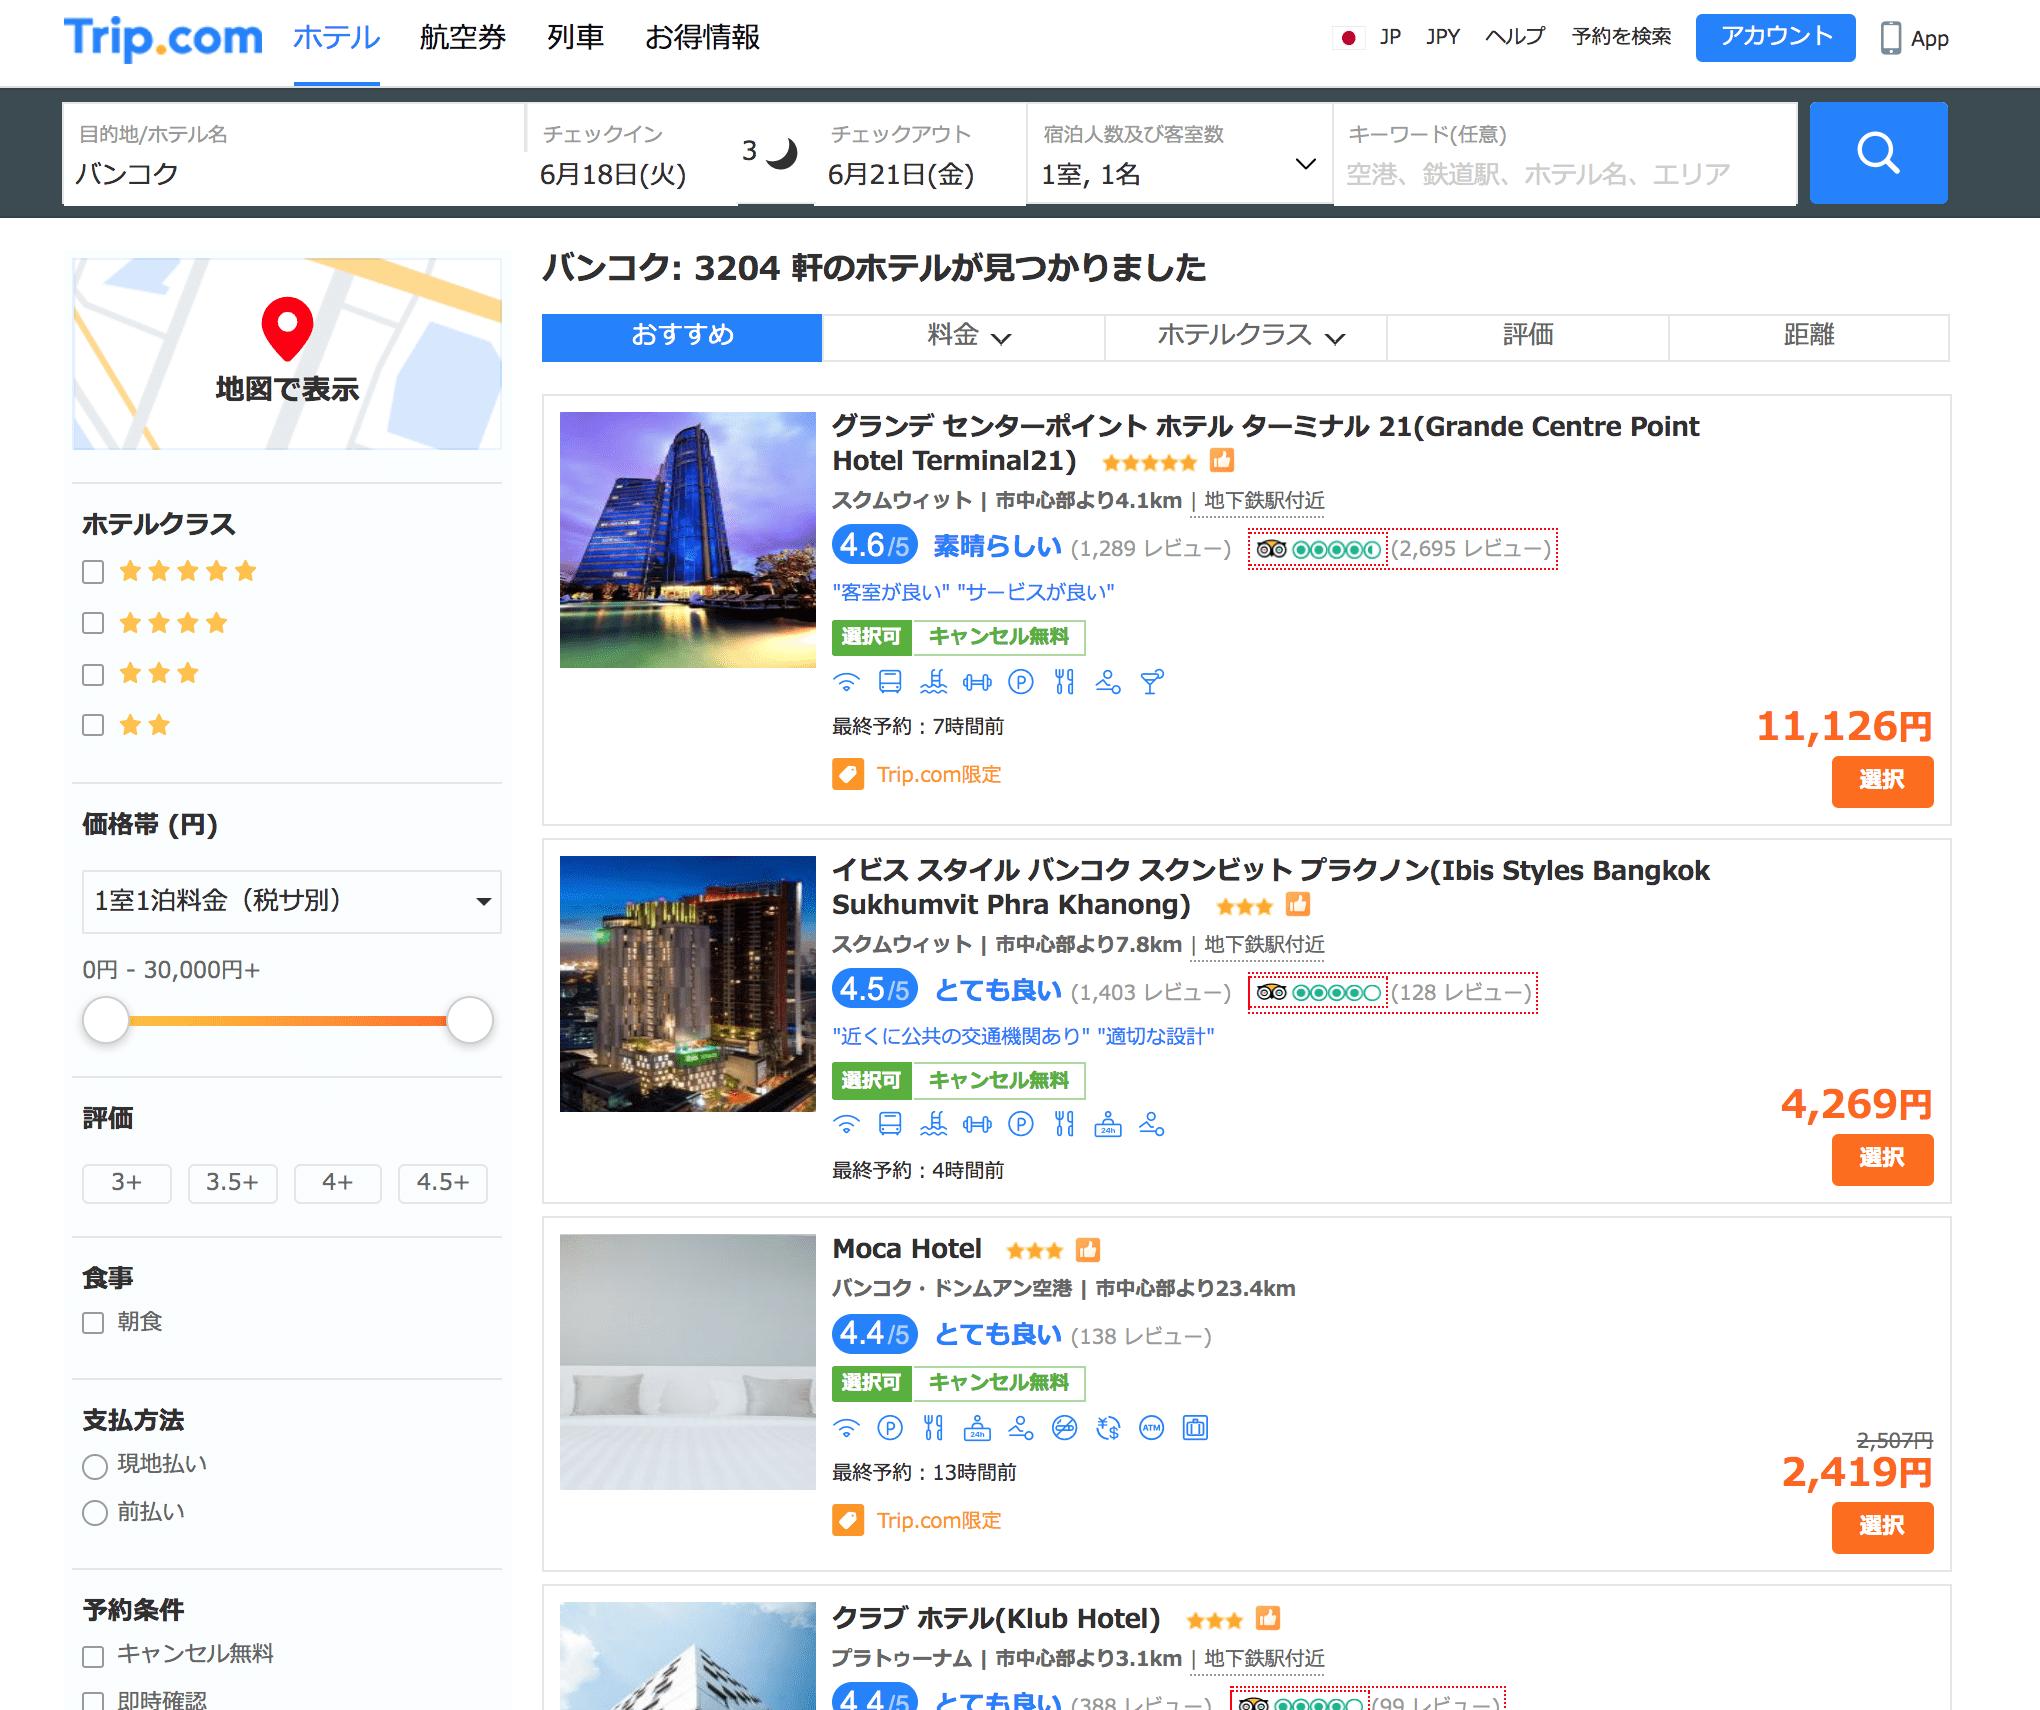 Trip.comでホテルを選ぶ